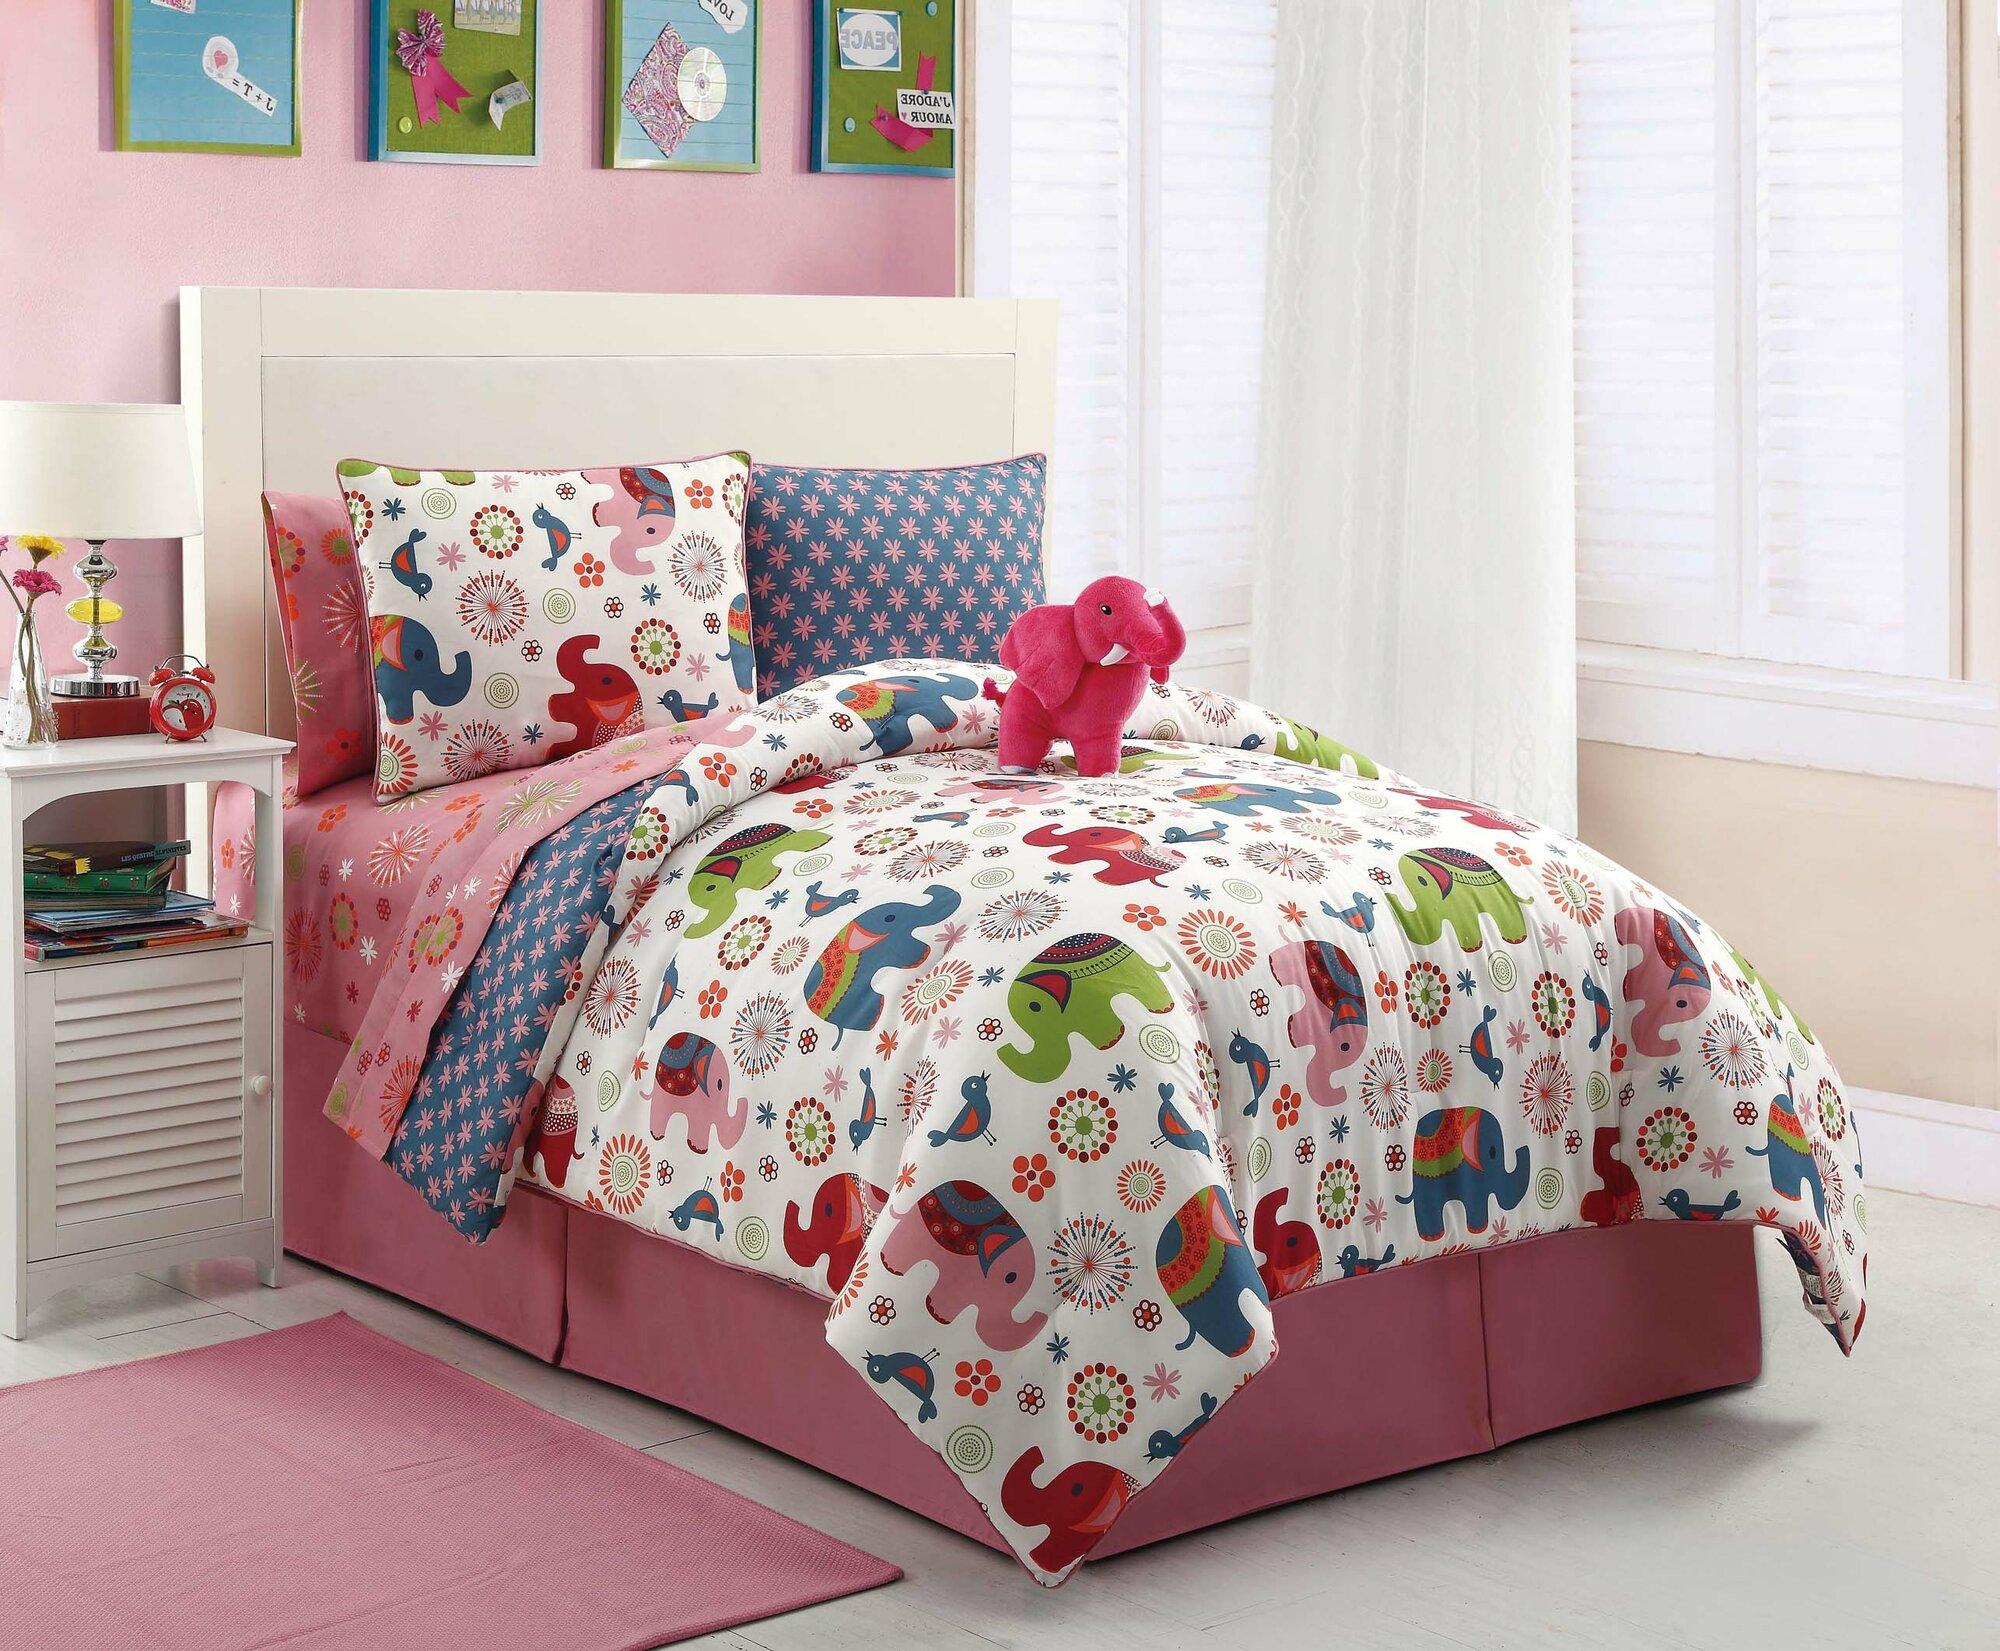 girl pink zoo safari elephant floral twin full comforter sheet set plush animal ebay. Black Bedroom Furniture Sets. Home Design Ideas